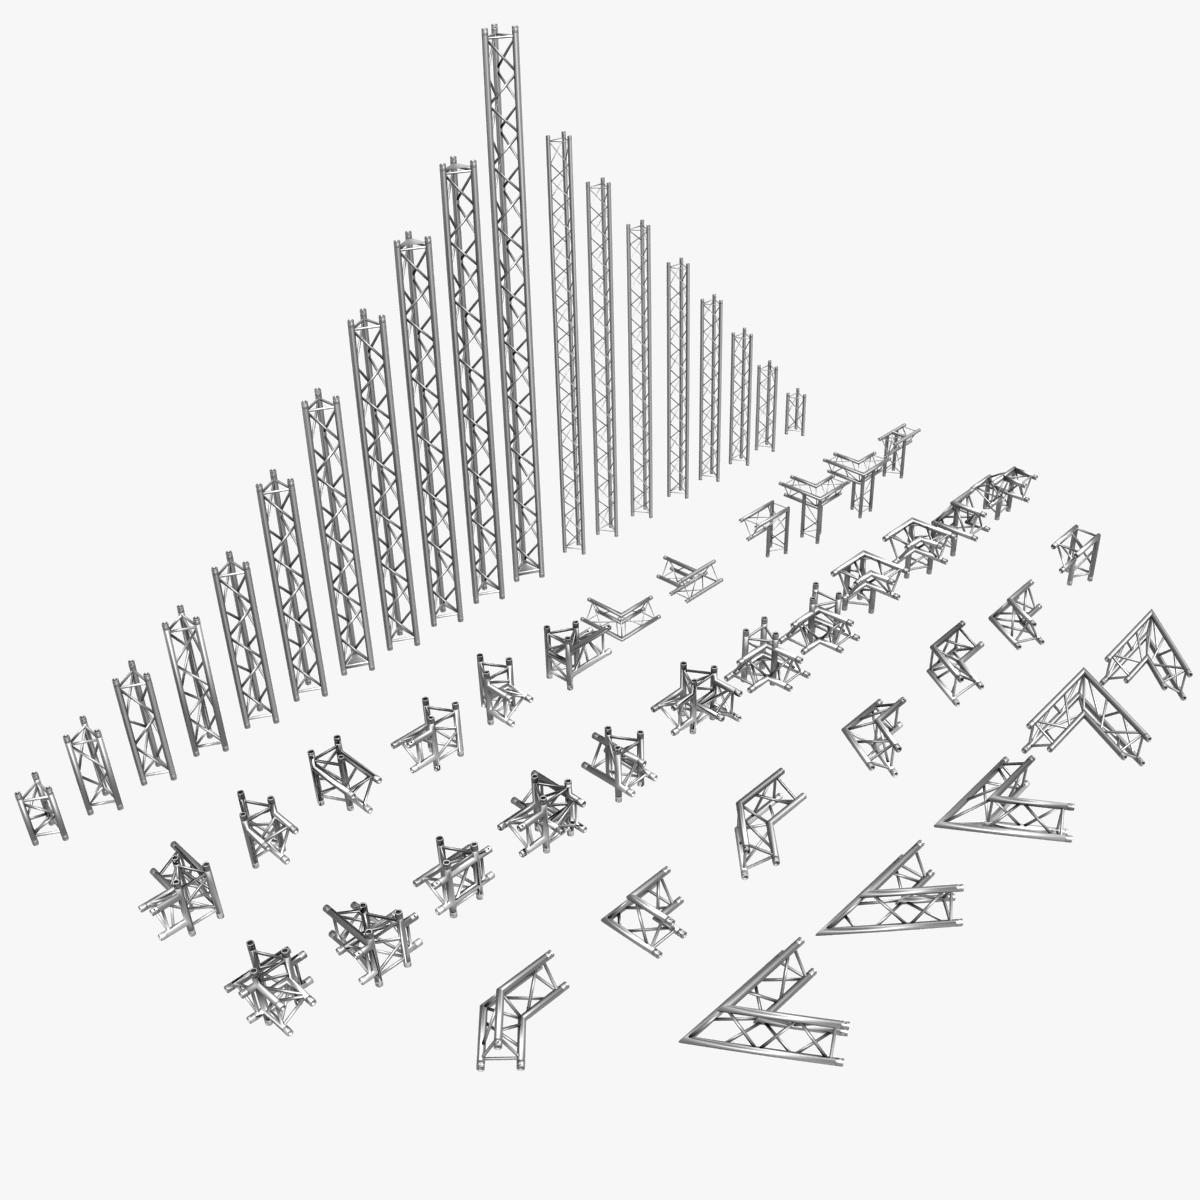 triangular trusses (collection 55 modular pieces) 3d model 3ds max dxf fbx c4d dae texture obj 216208